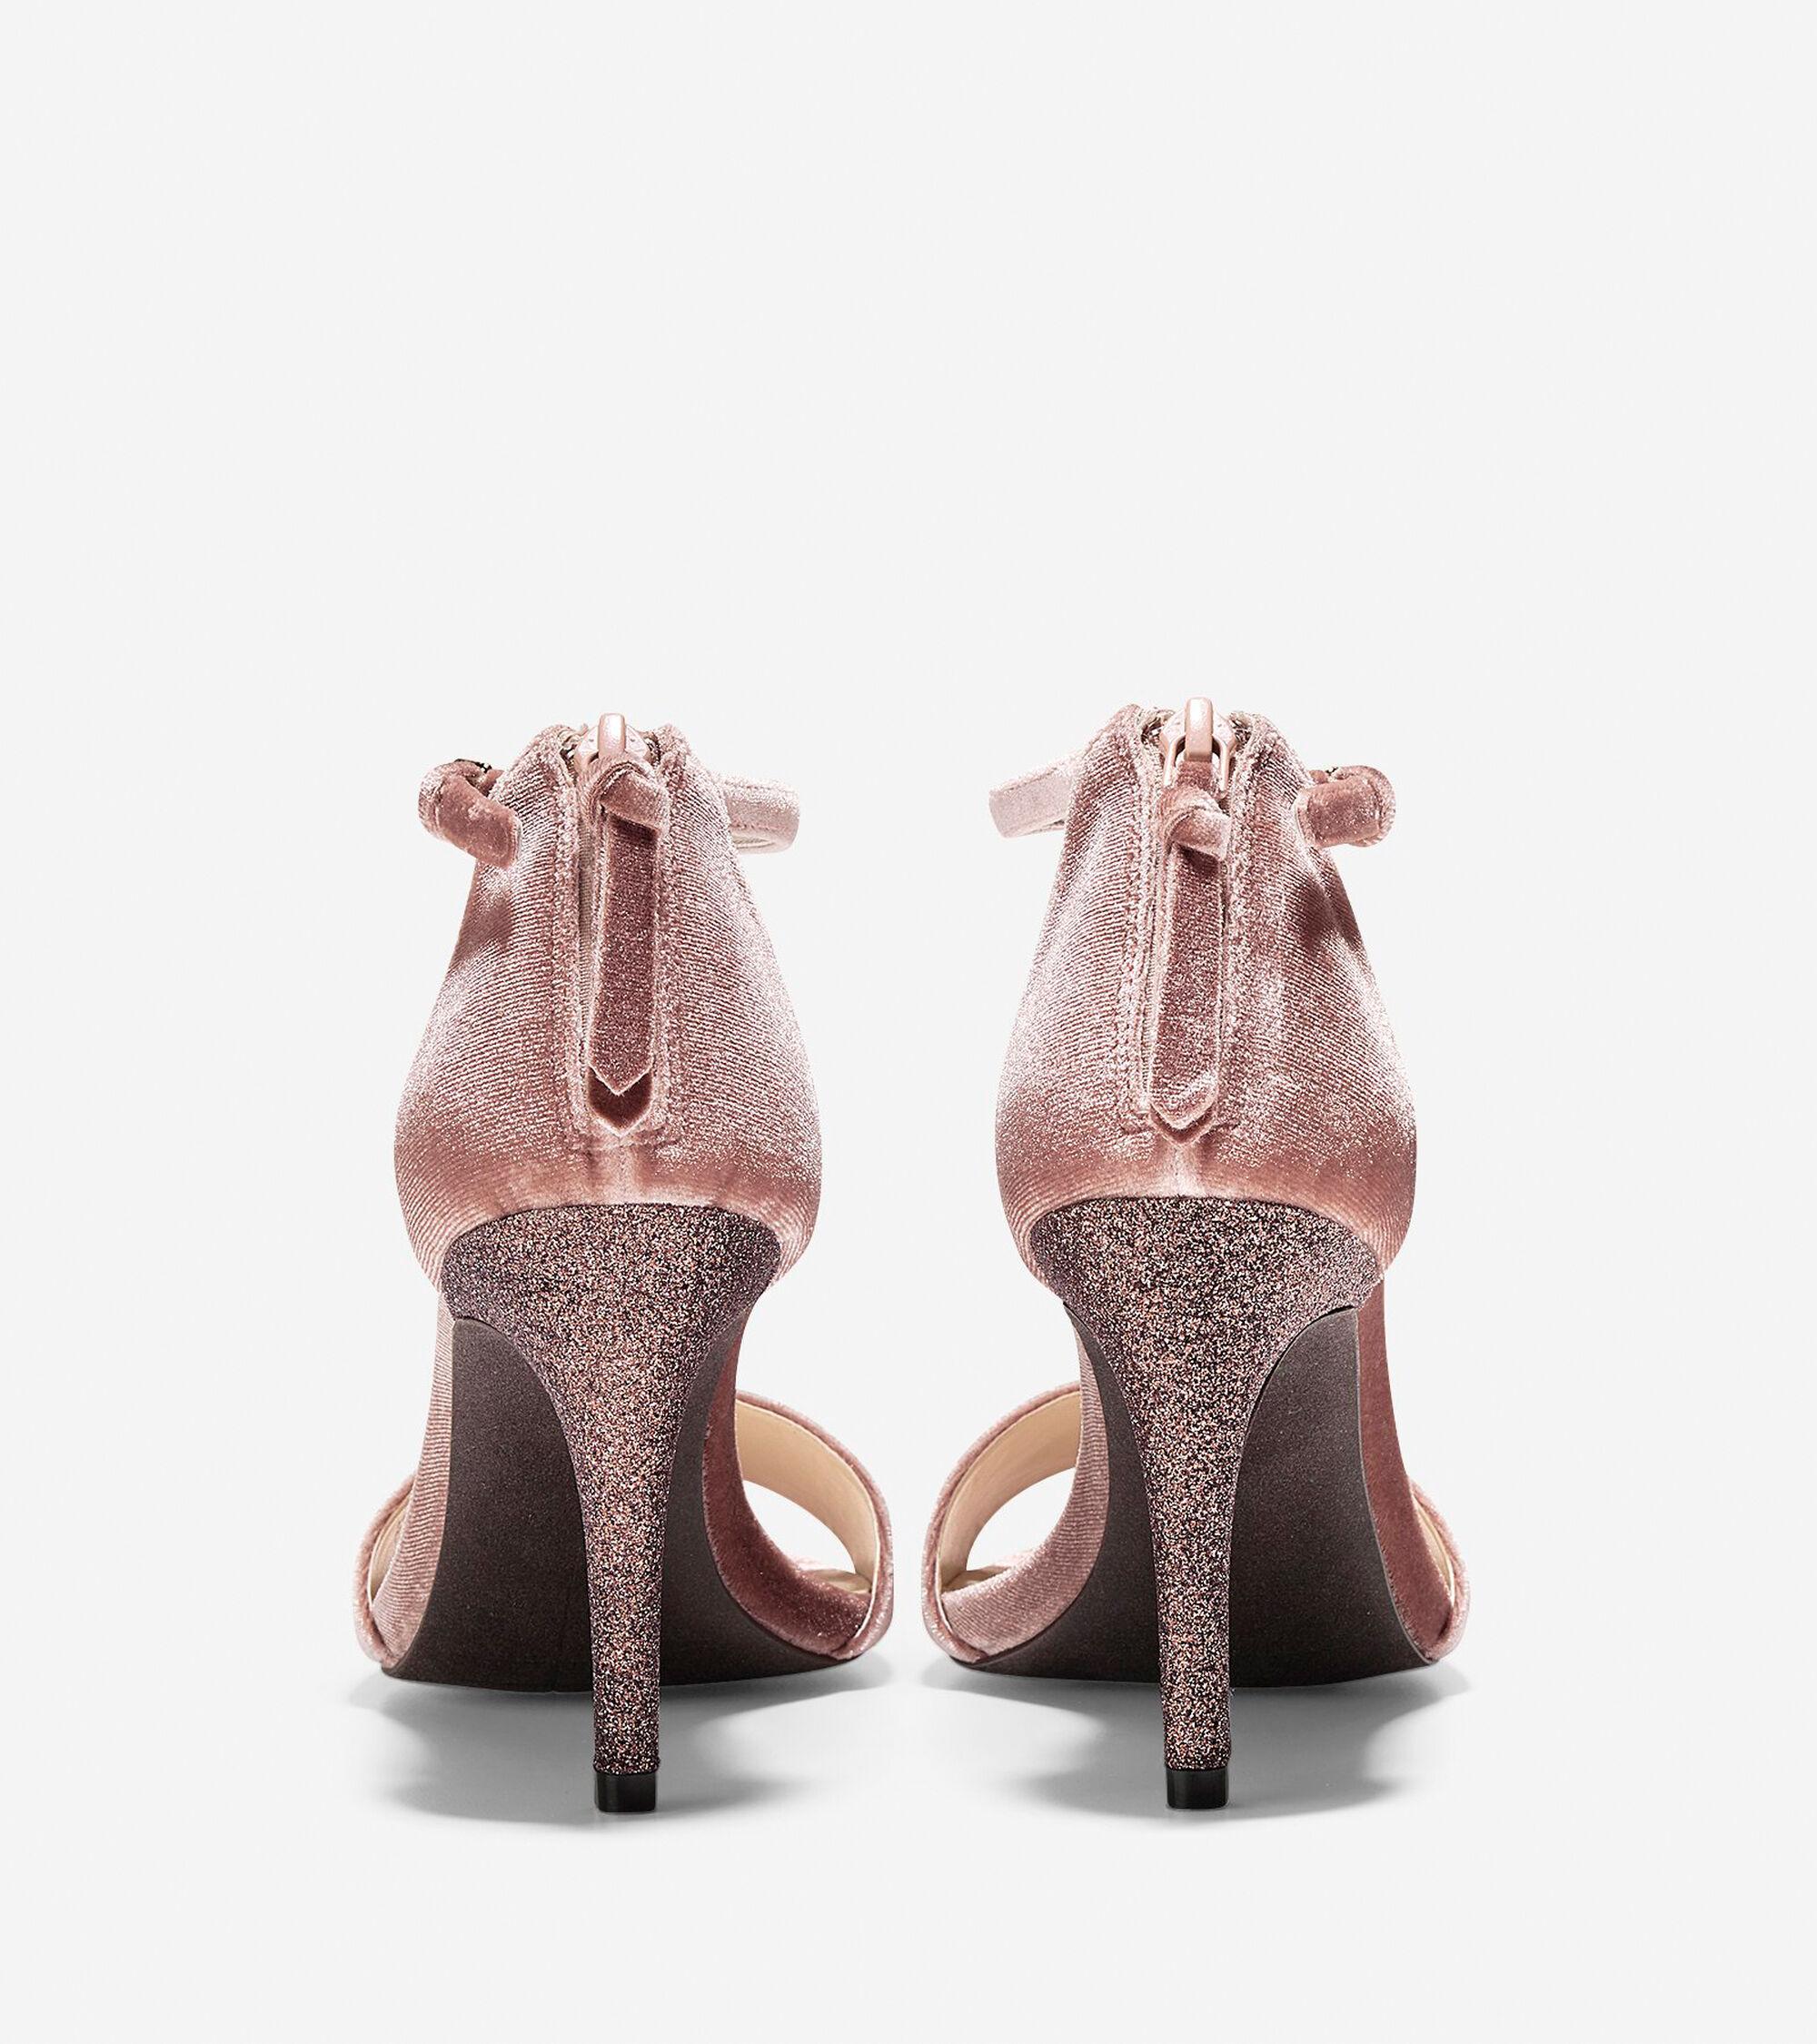 dc6bbbdbac76 Clara Grand Sandals 85mm in Nude Velvet-Glitter